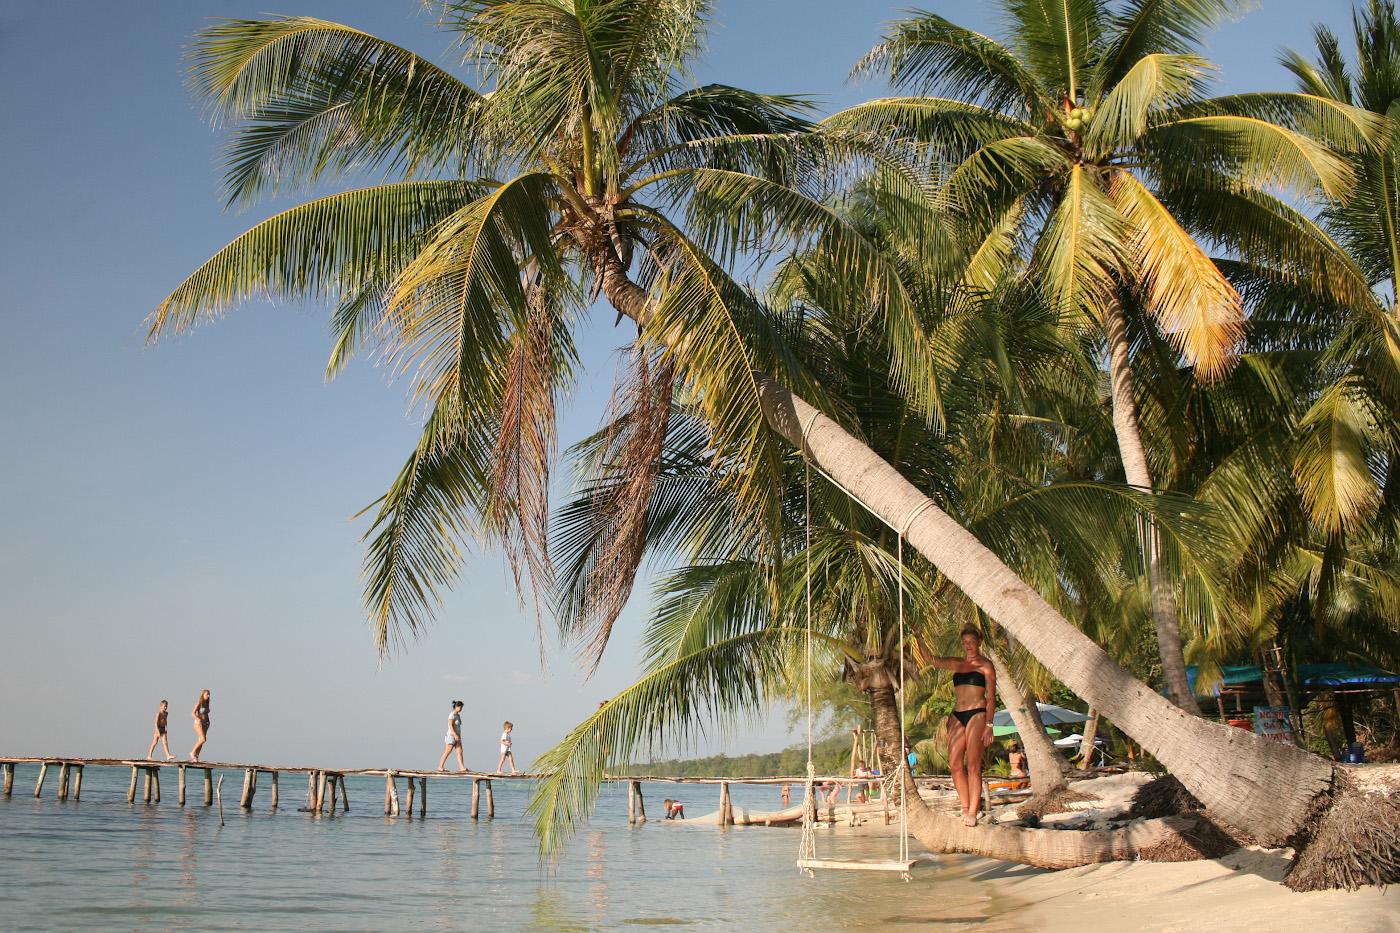 Фотография 16. Мостик на Пляже с морскими звёздами (BaiRach Vem (Starfish Beach)). 1/400, 7.1, 400, 80.